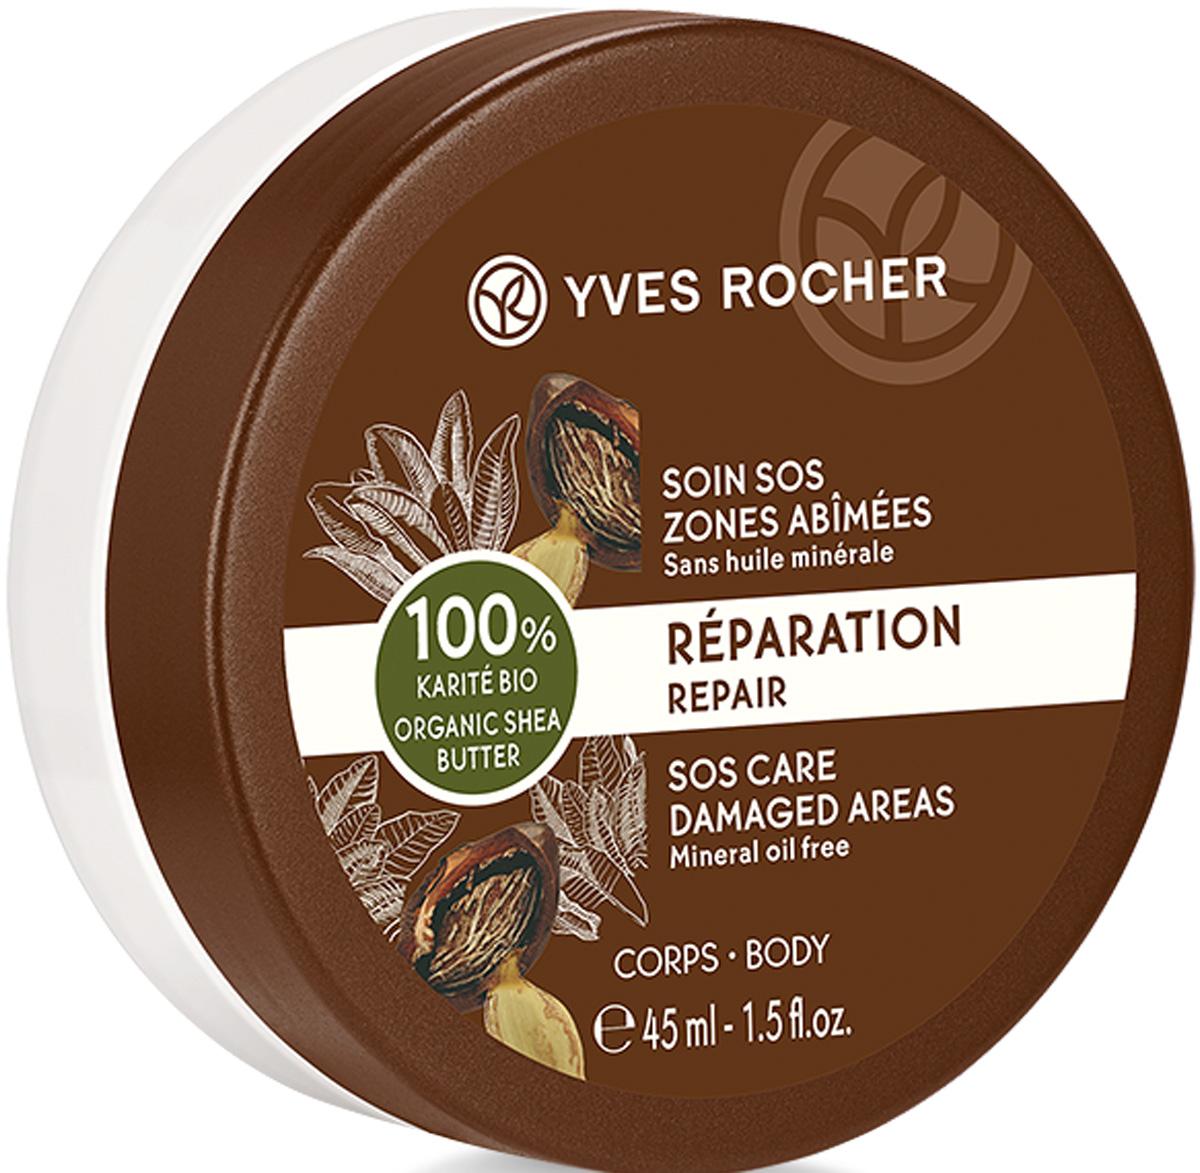 Yves Rocher интенсивно восстанавливающий концентрат для тела 100% каритэ, 45 мл концентрат для тела 45 мл yves rocher